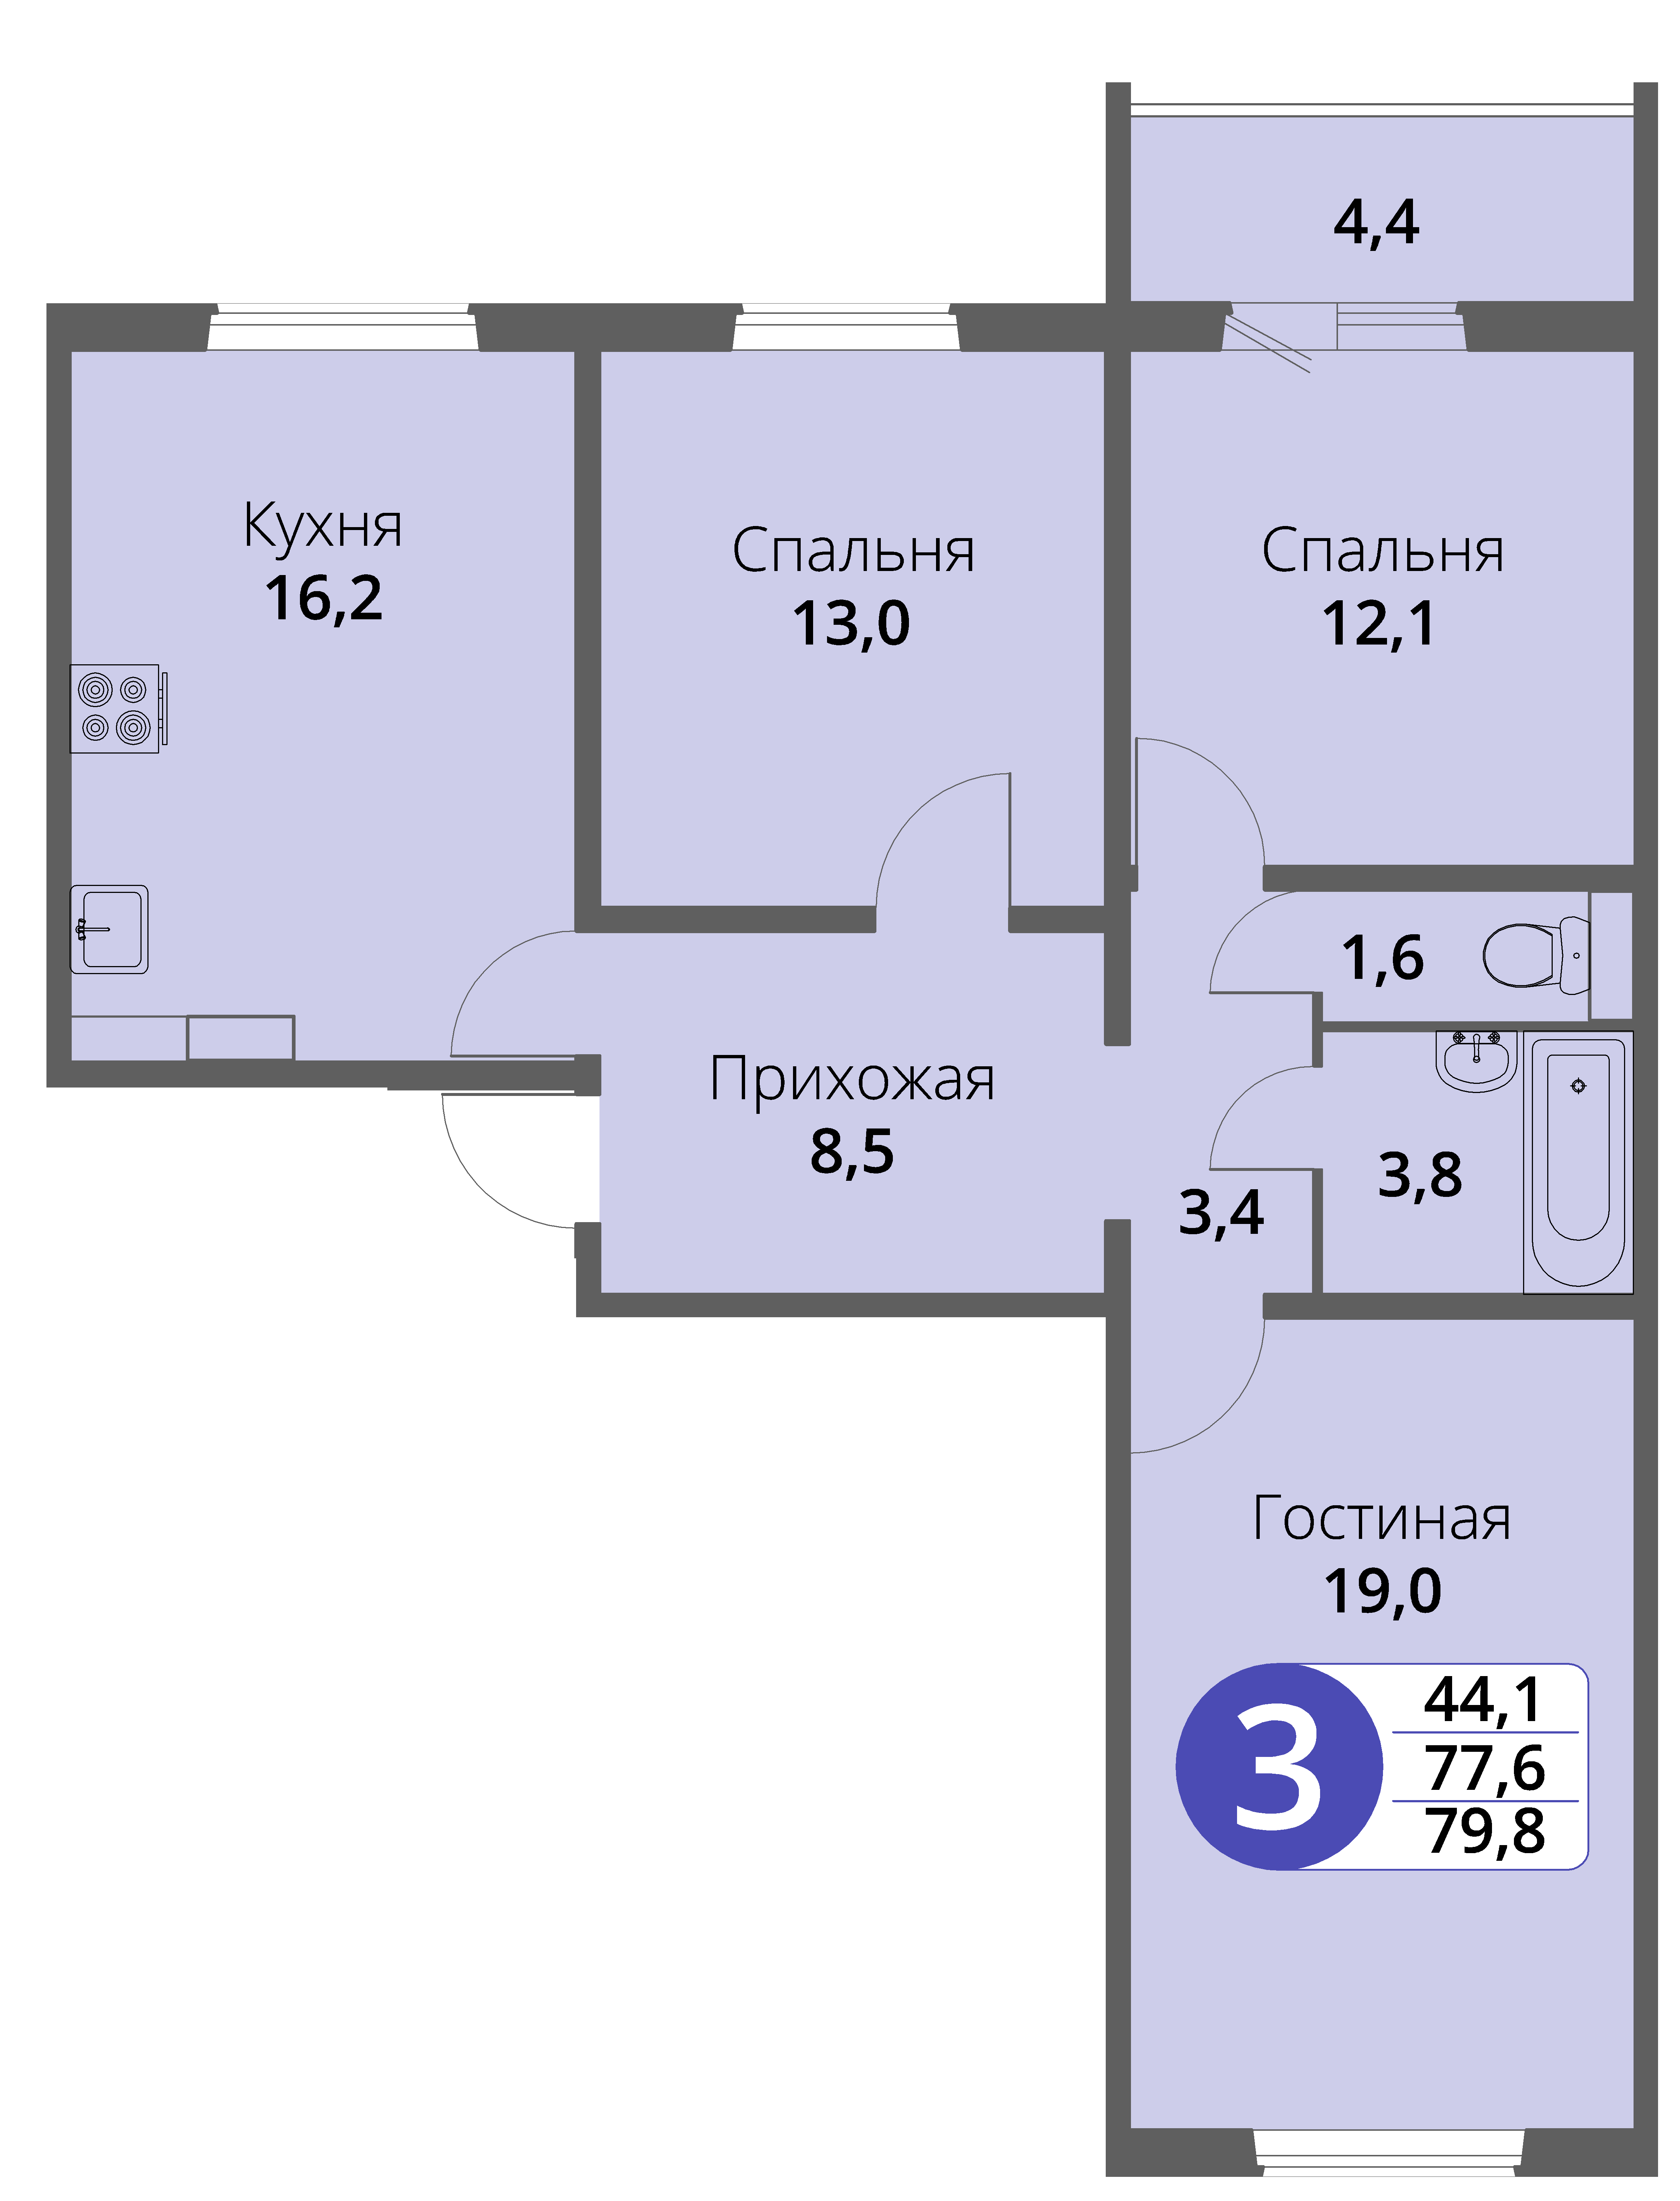 Зареченская 1-1, квартира 106 - Трехкомнатная